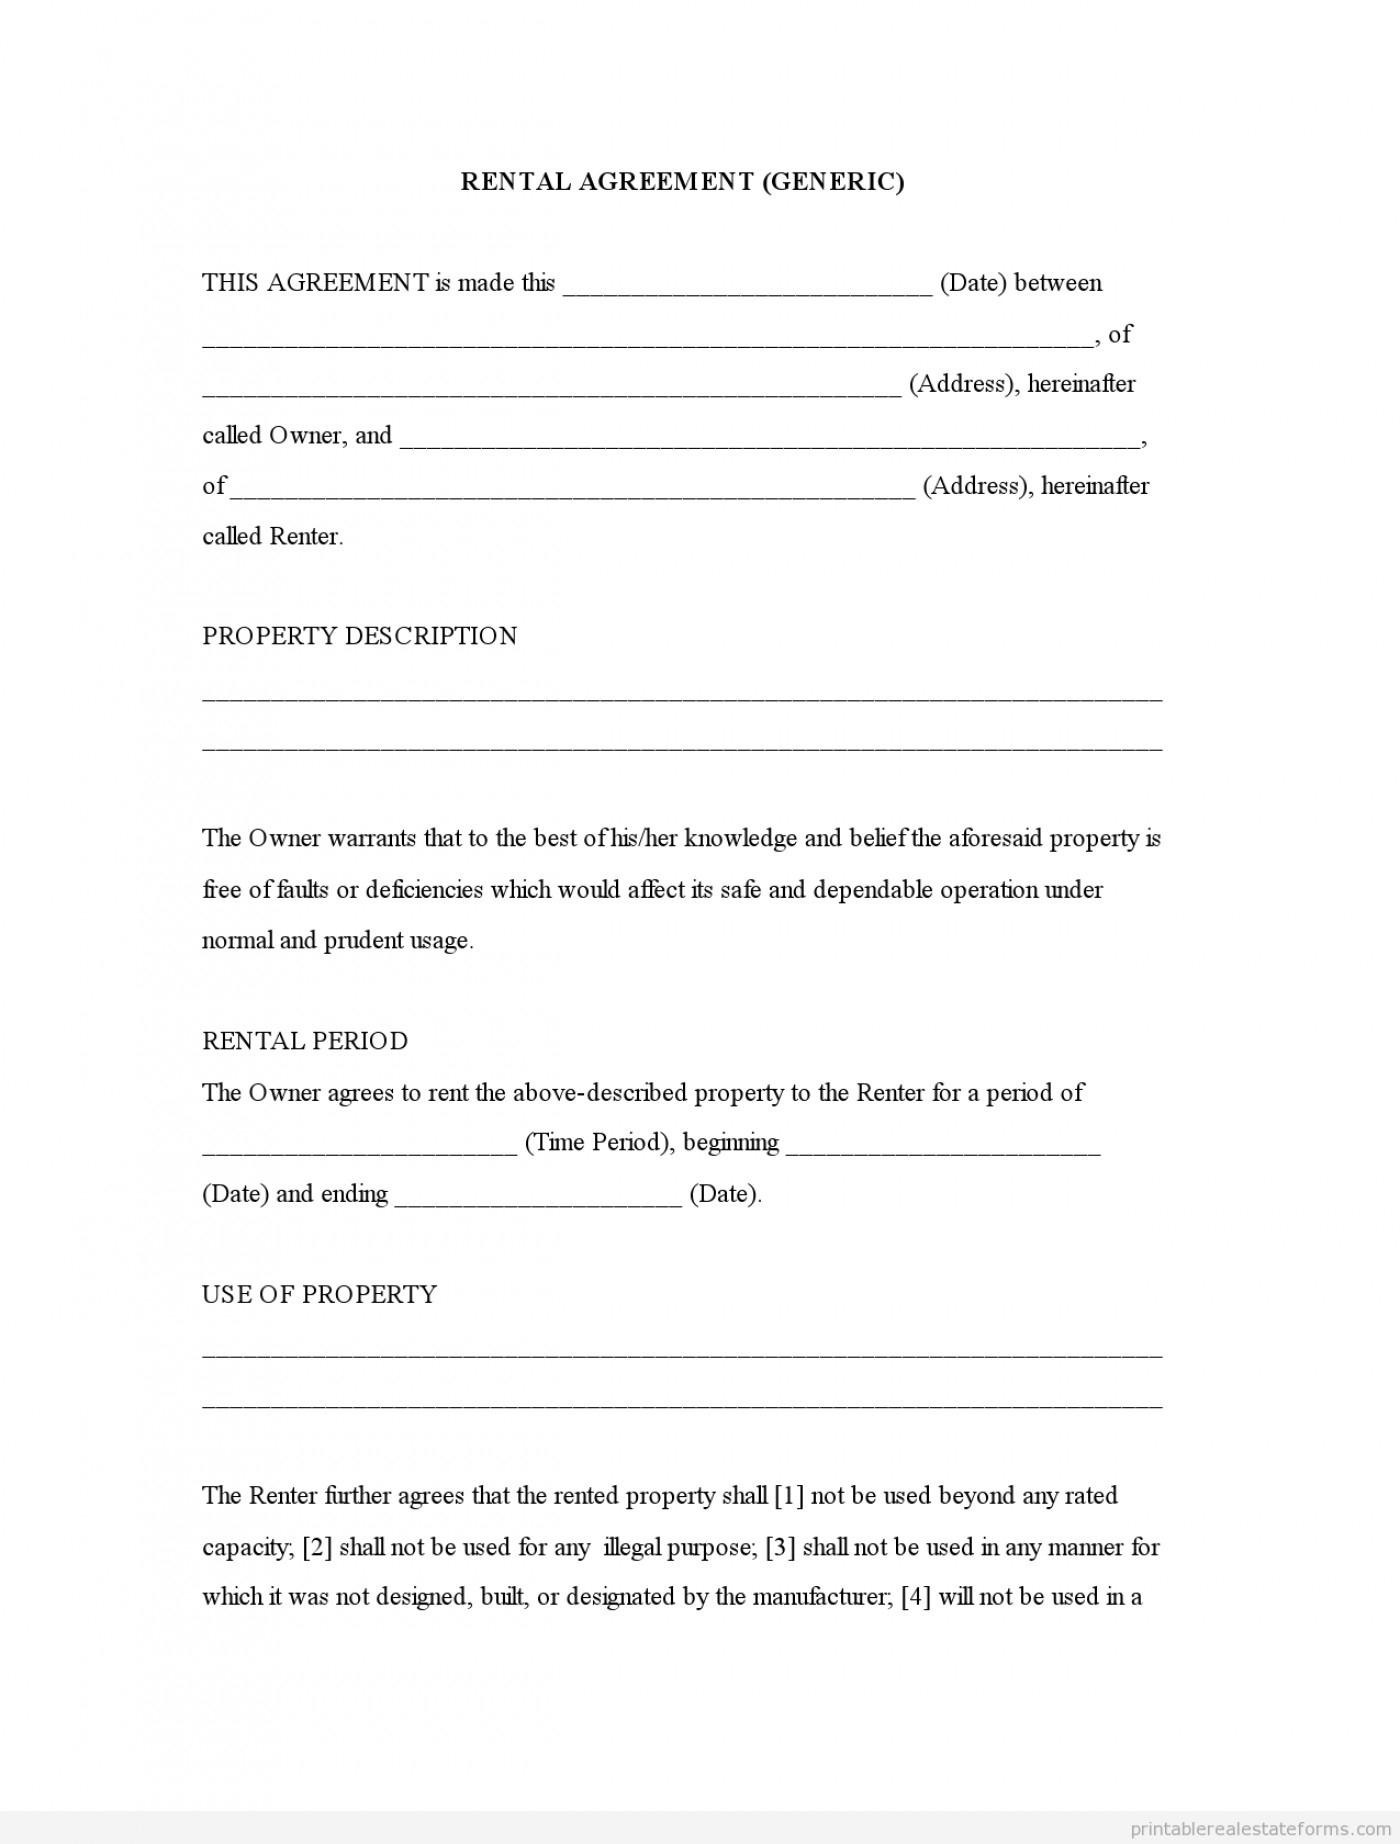 Printable Blank Rental Lease Agreement - Mandanlibrary - Free Printable Rental Lease Agreement